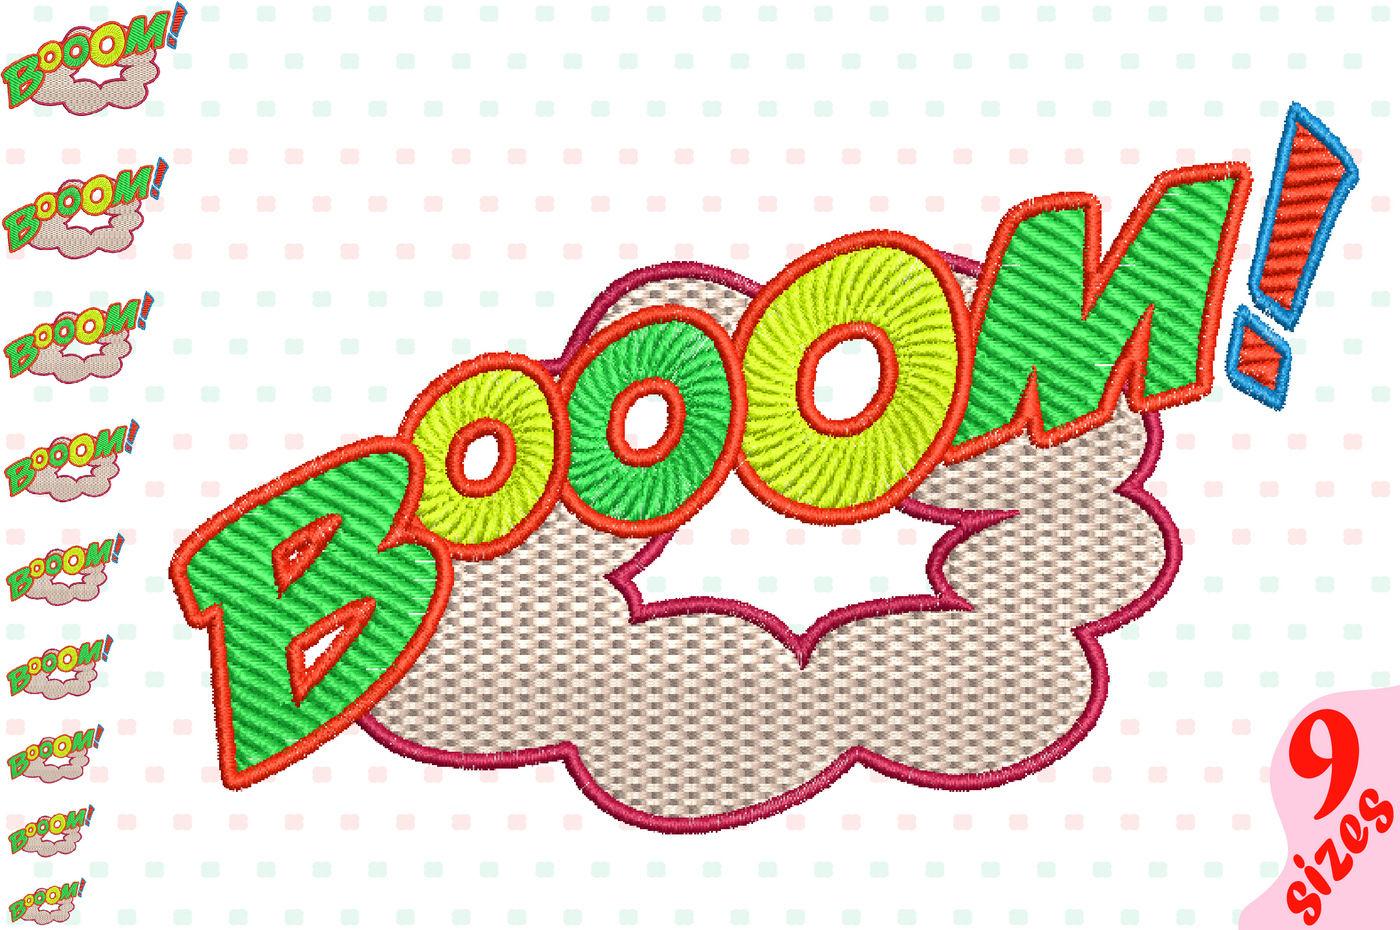 Booom Comic Book Embroidery Design Machine Instant Download